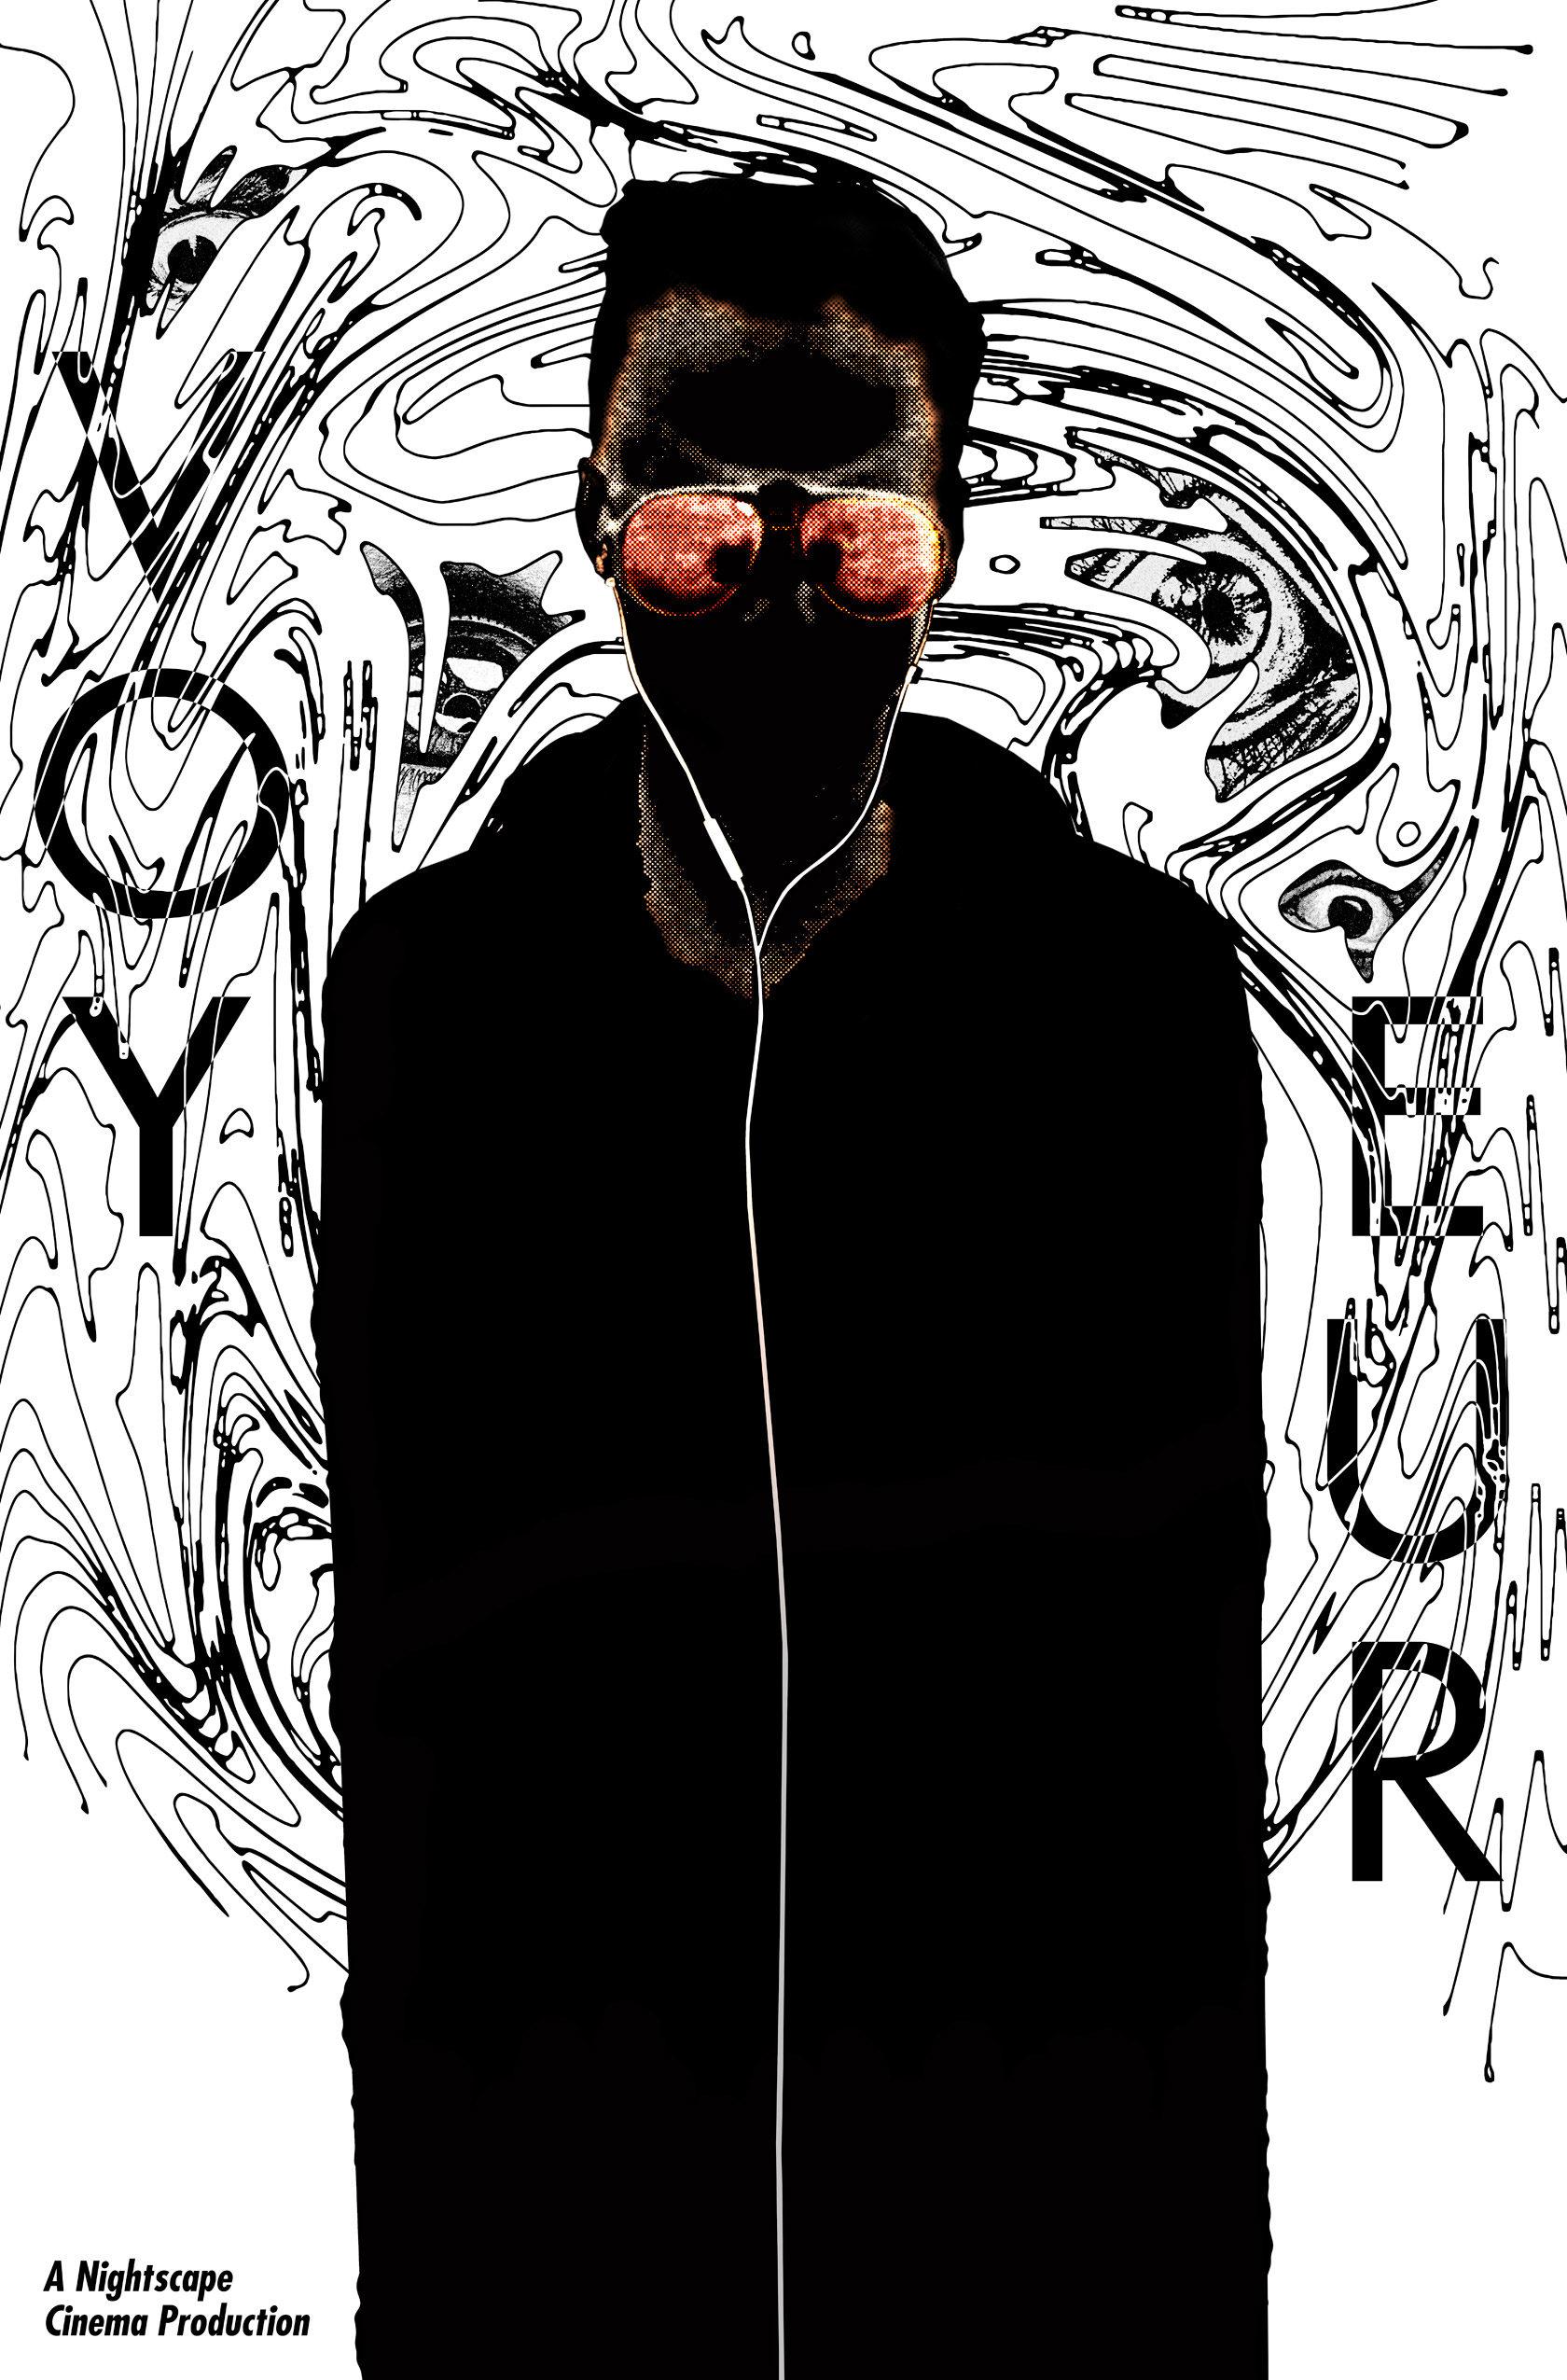 Voyeur-movie-poster-design-by-Furia